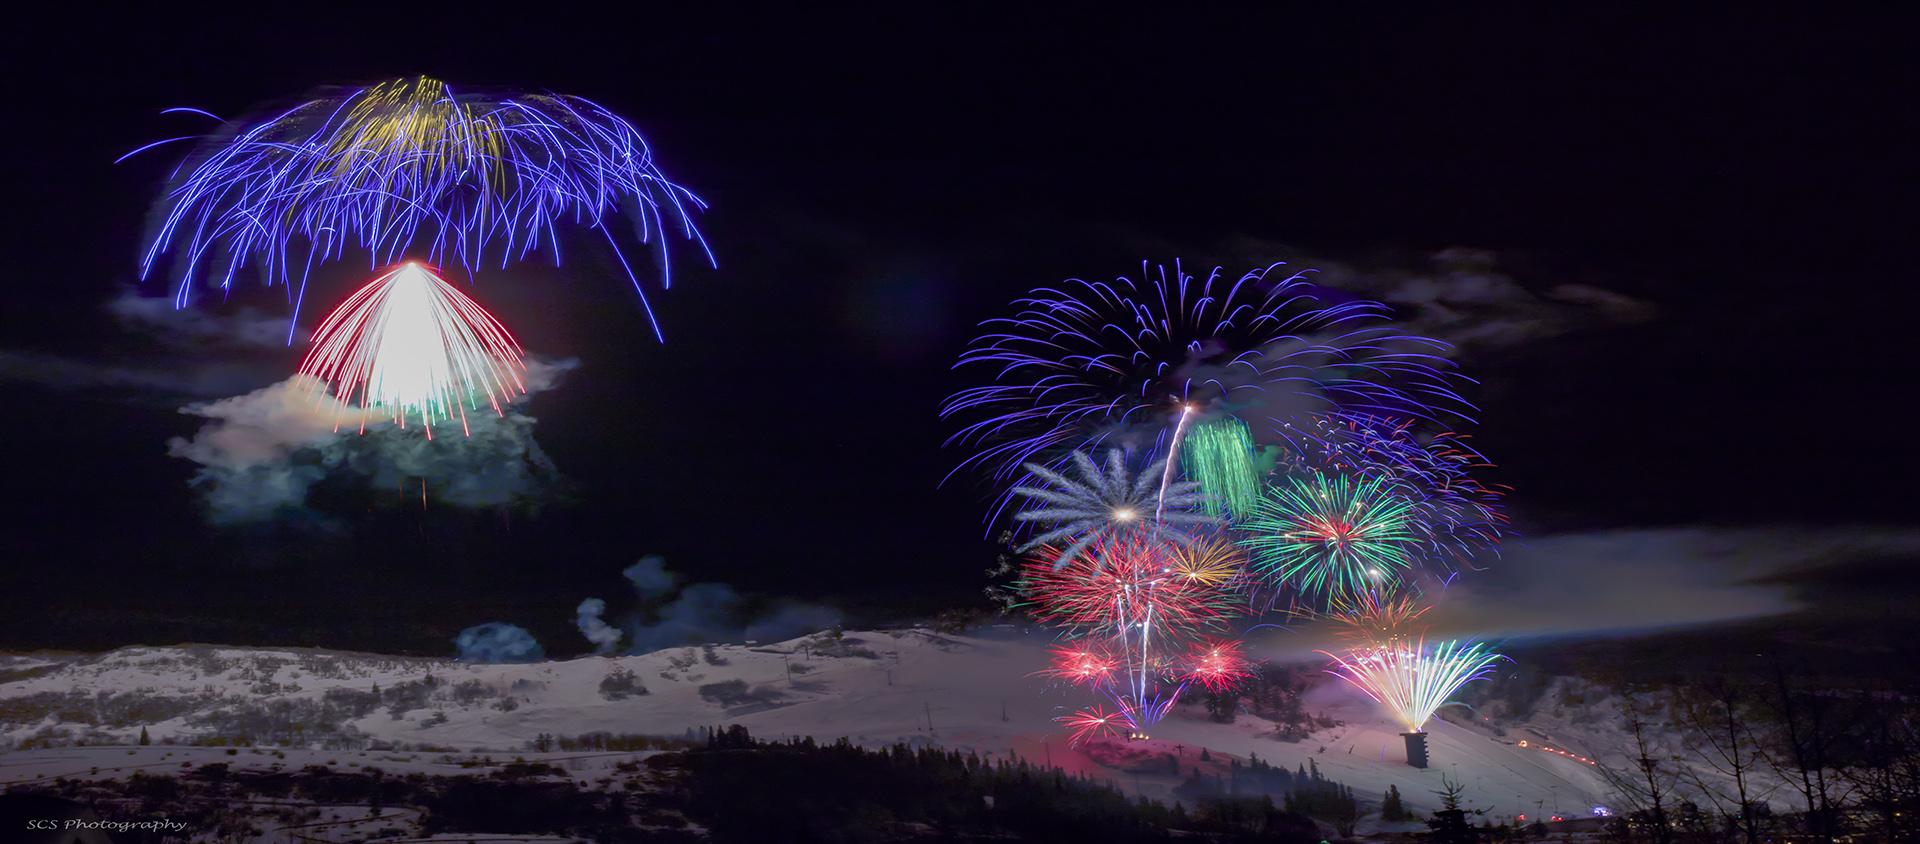 https://www.yvea.com/sites/default/files/revslider/image/fireworks%20layered%20with%20water%20mark.jpg